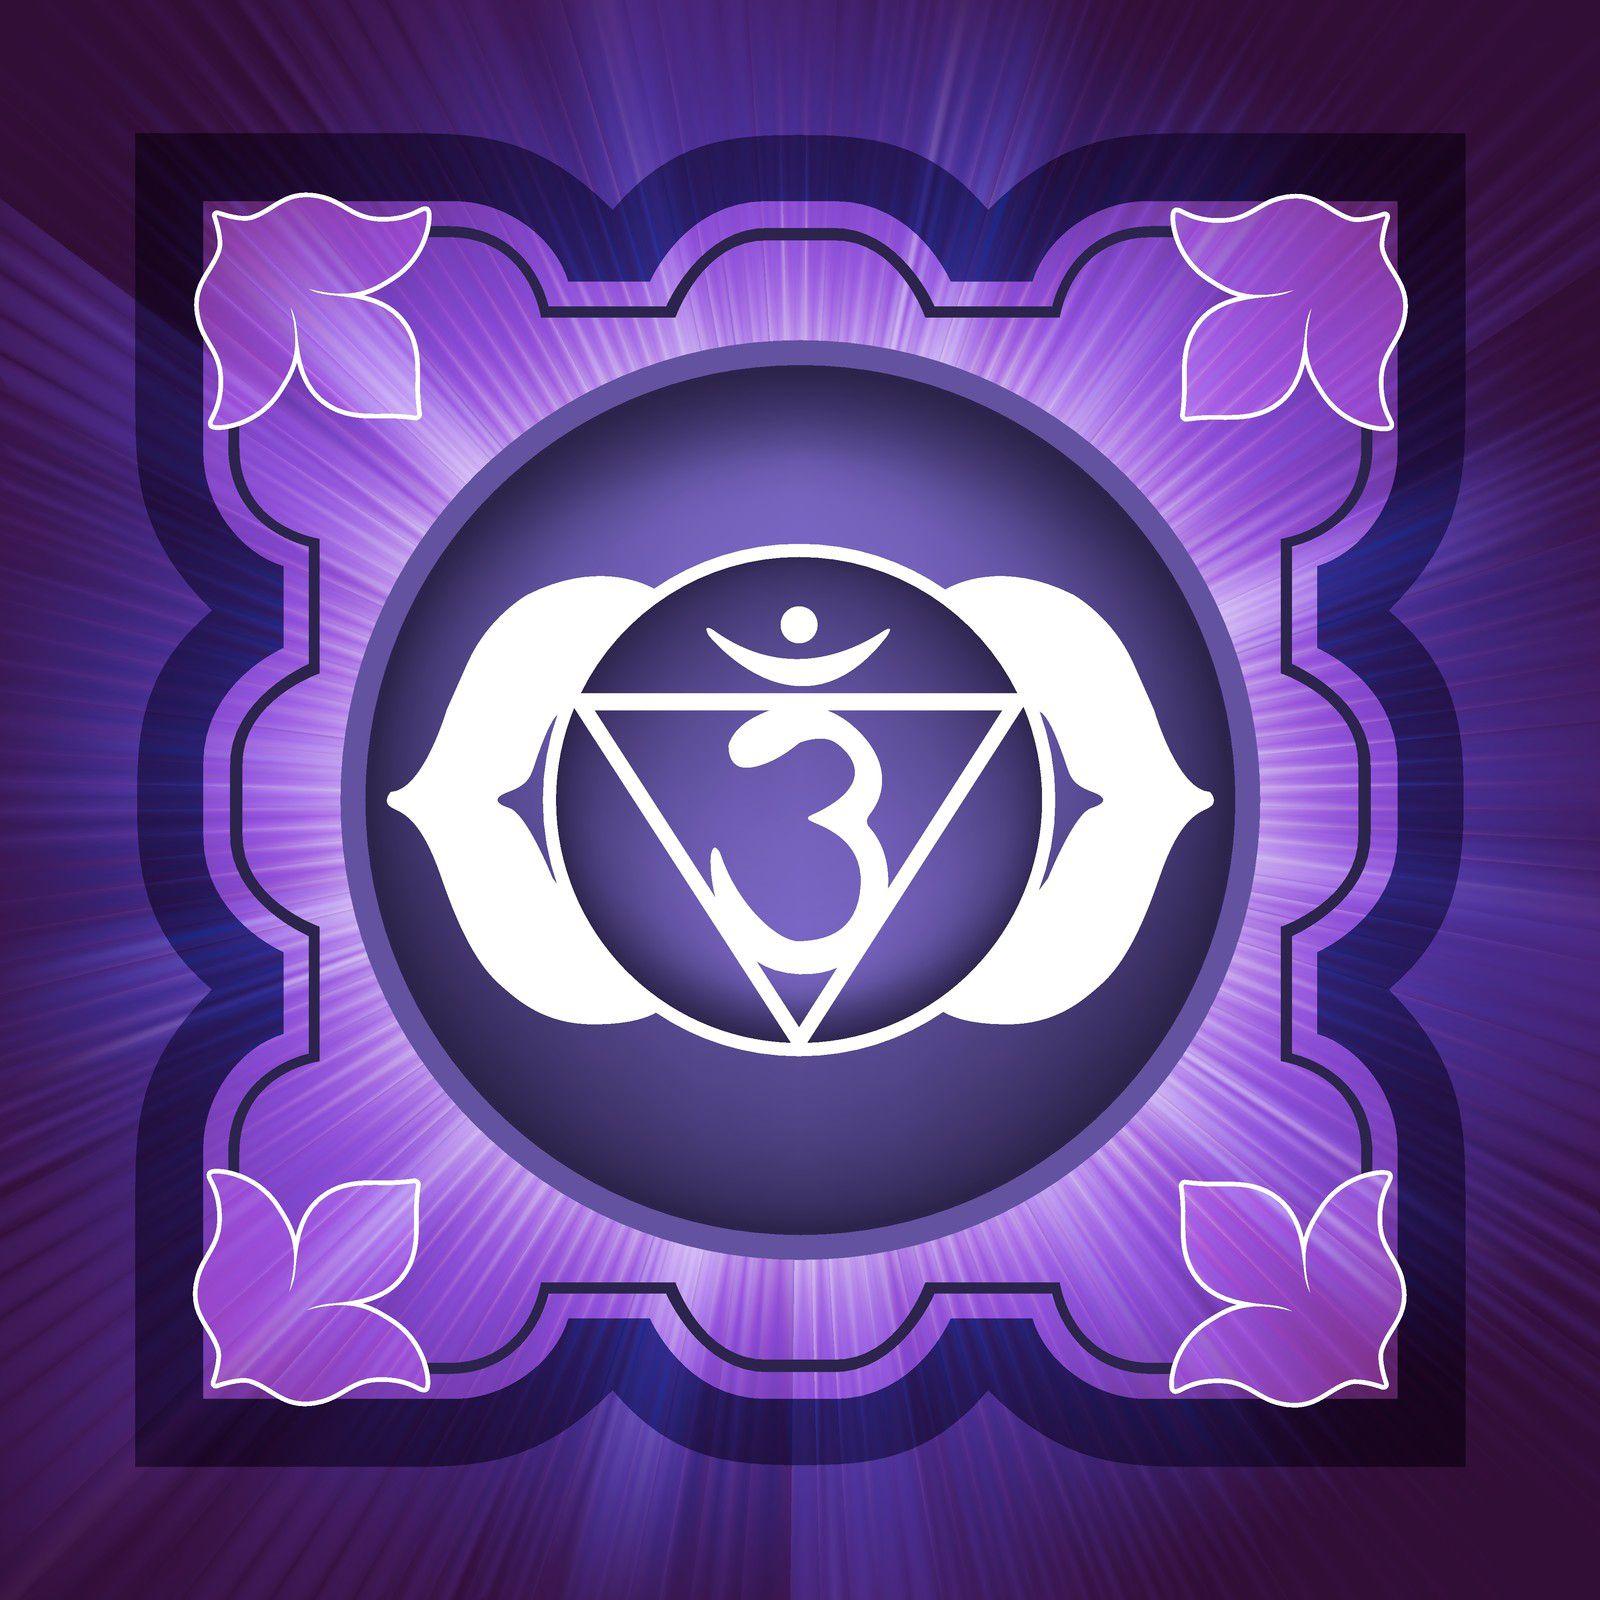 Benefits of opening the Ajna Chakra